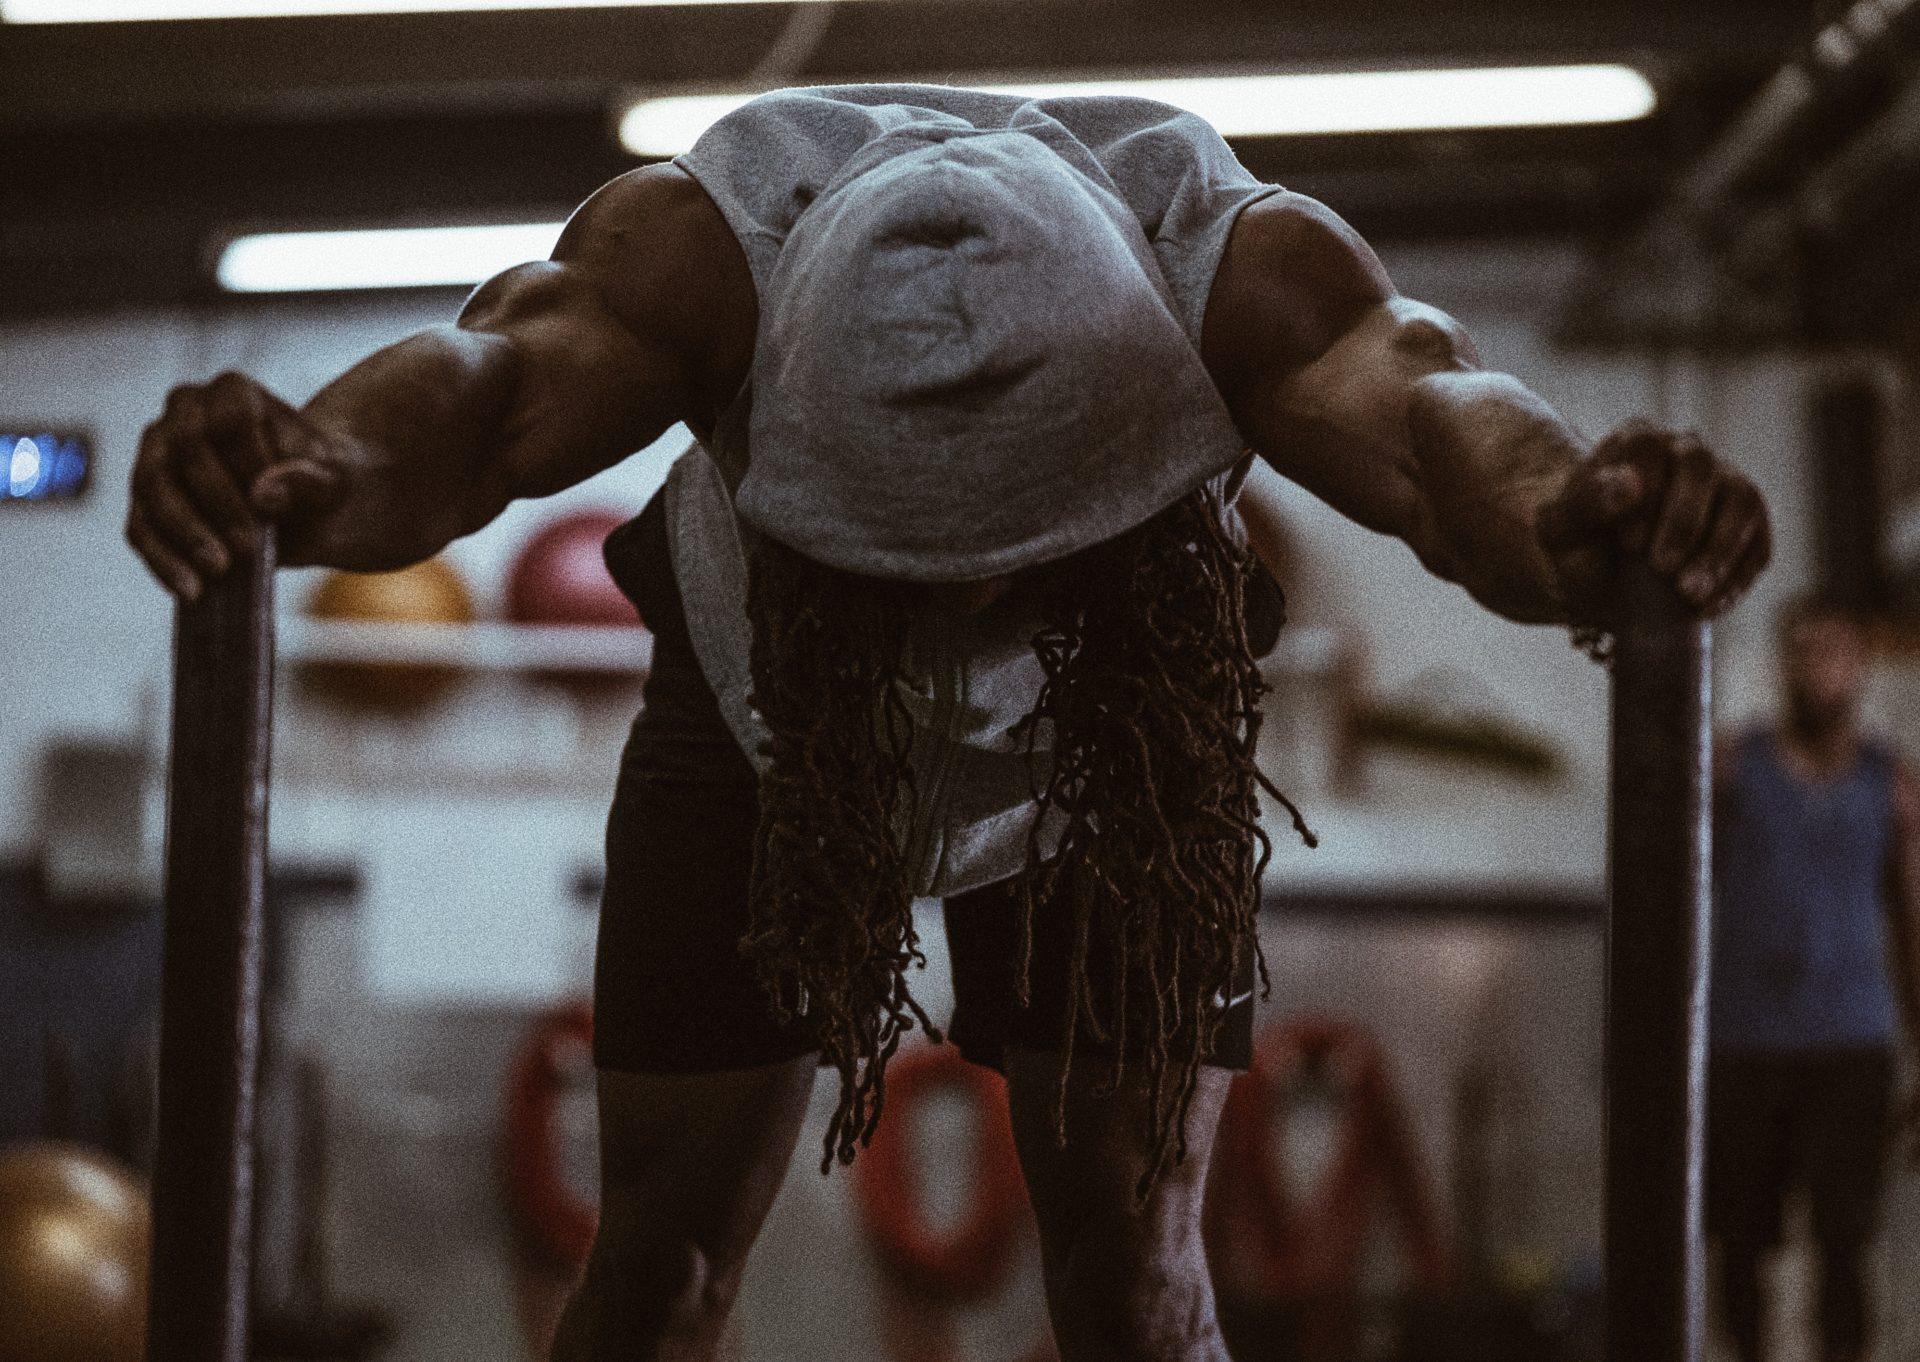 Gym rules